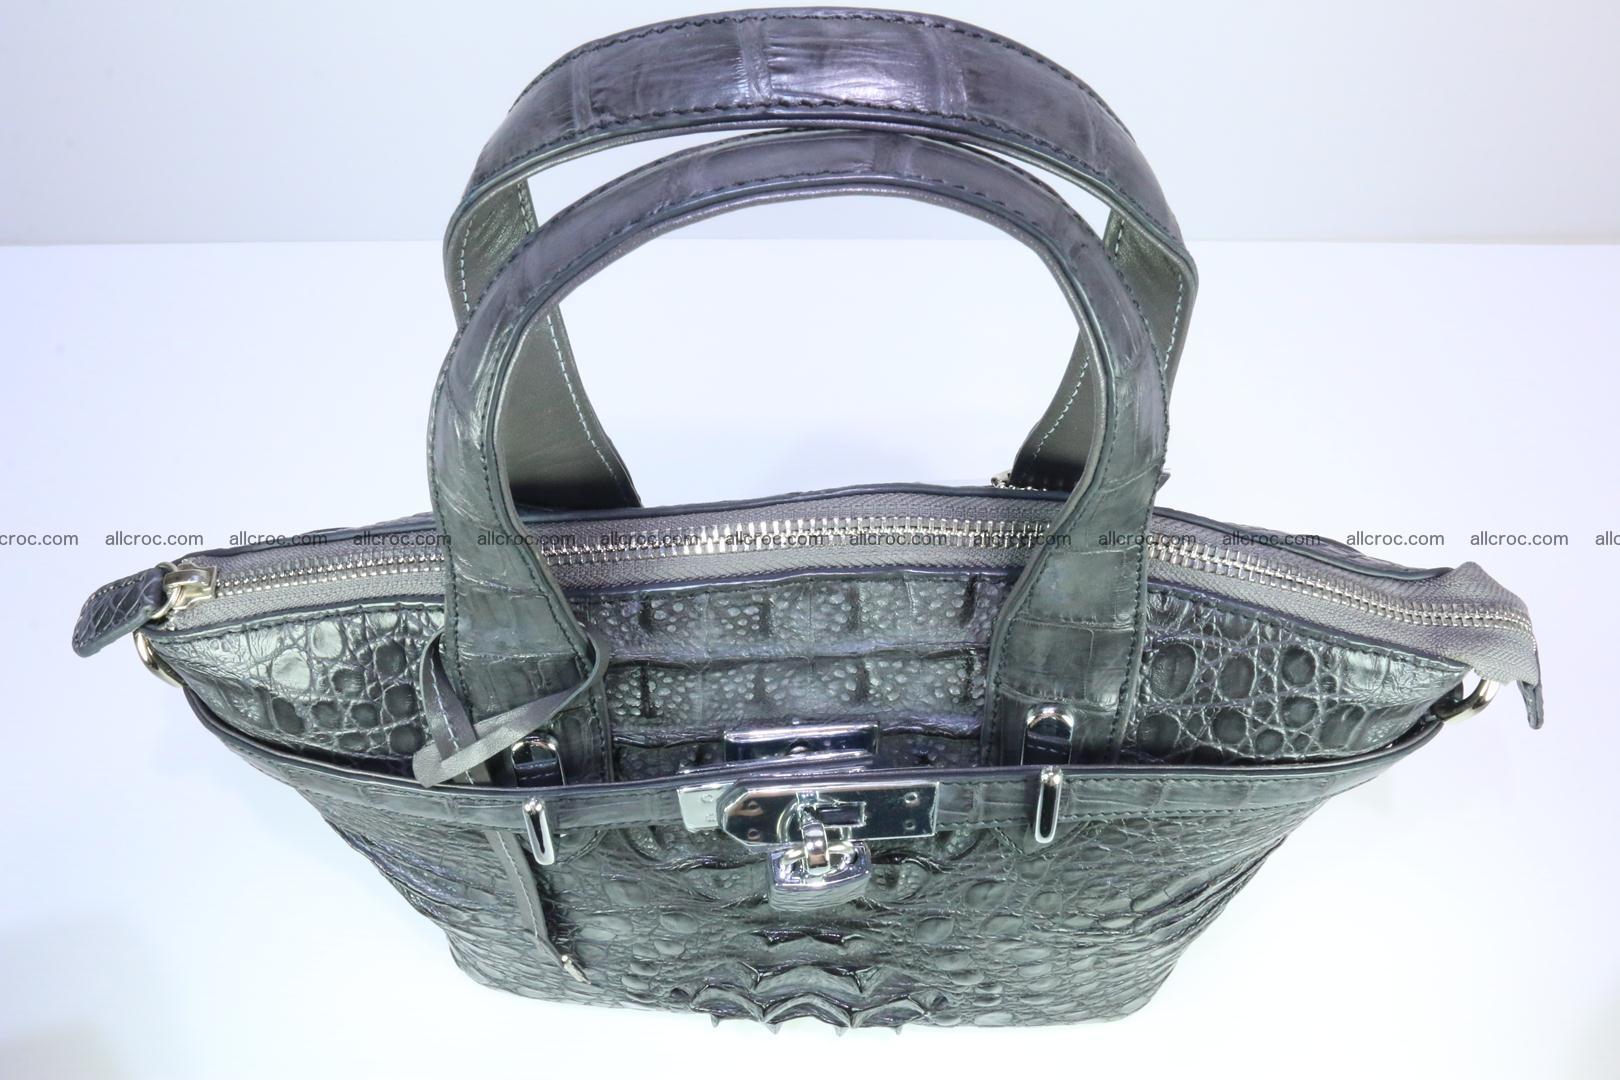 Genuine crocodile handbag for ladies 049 Foto 9